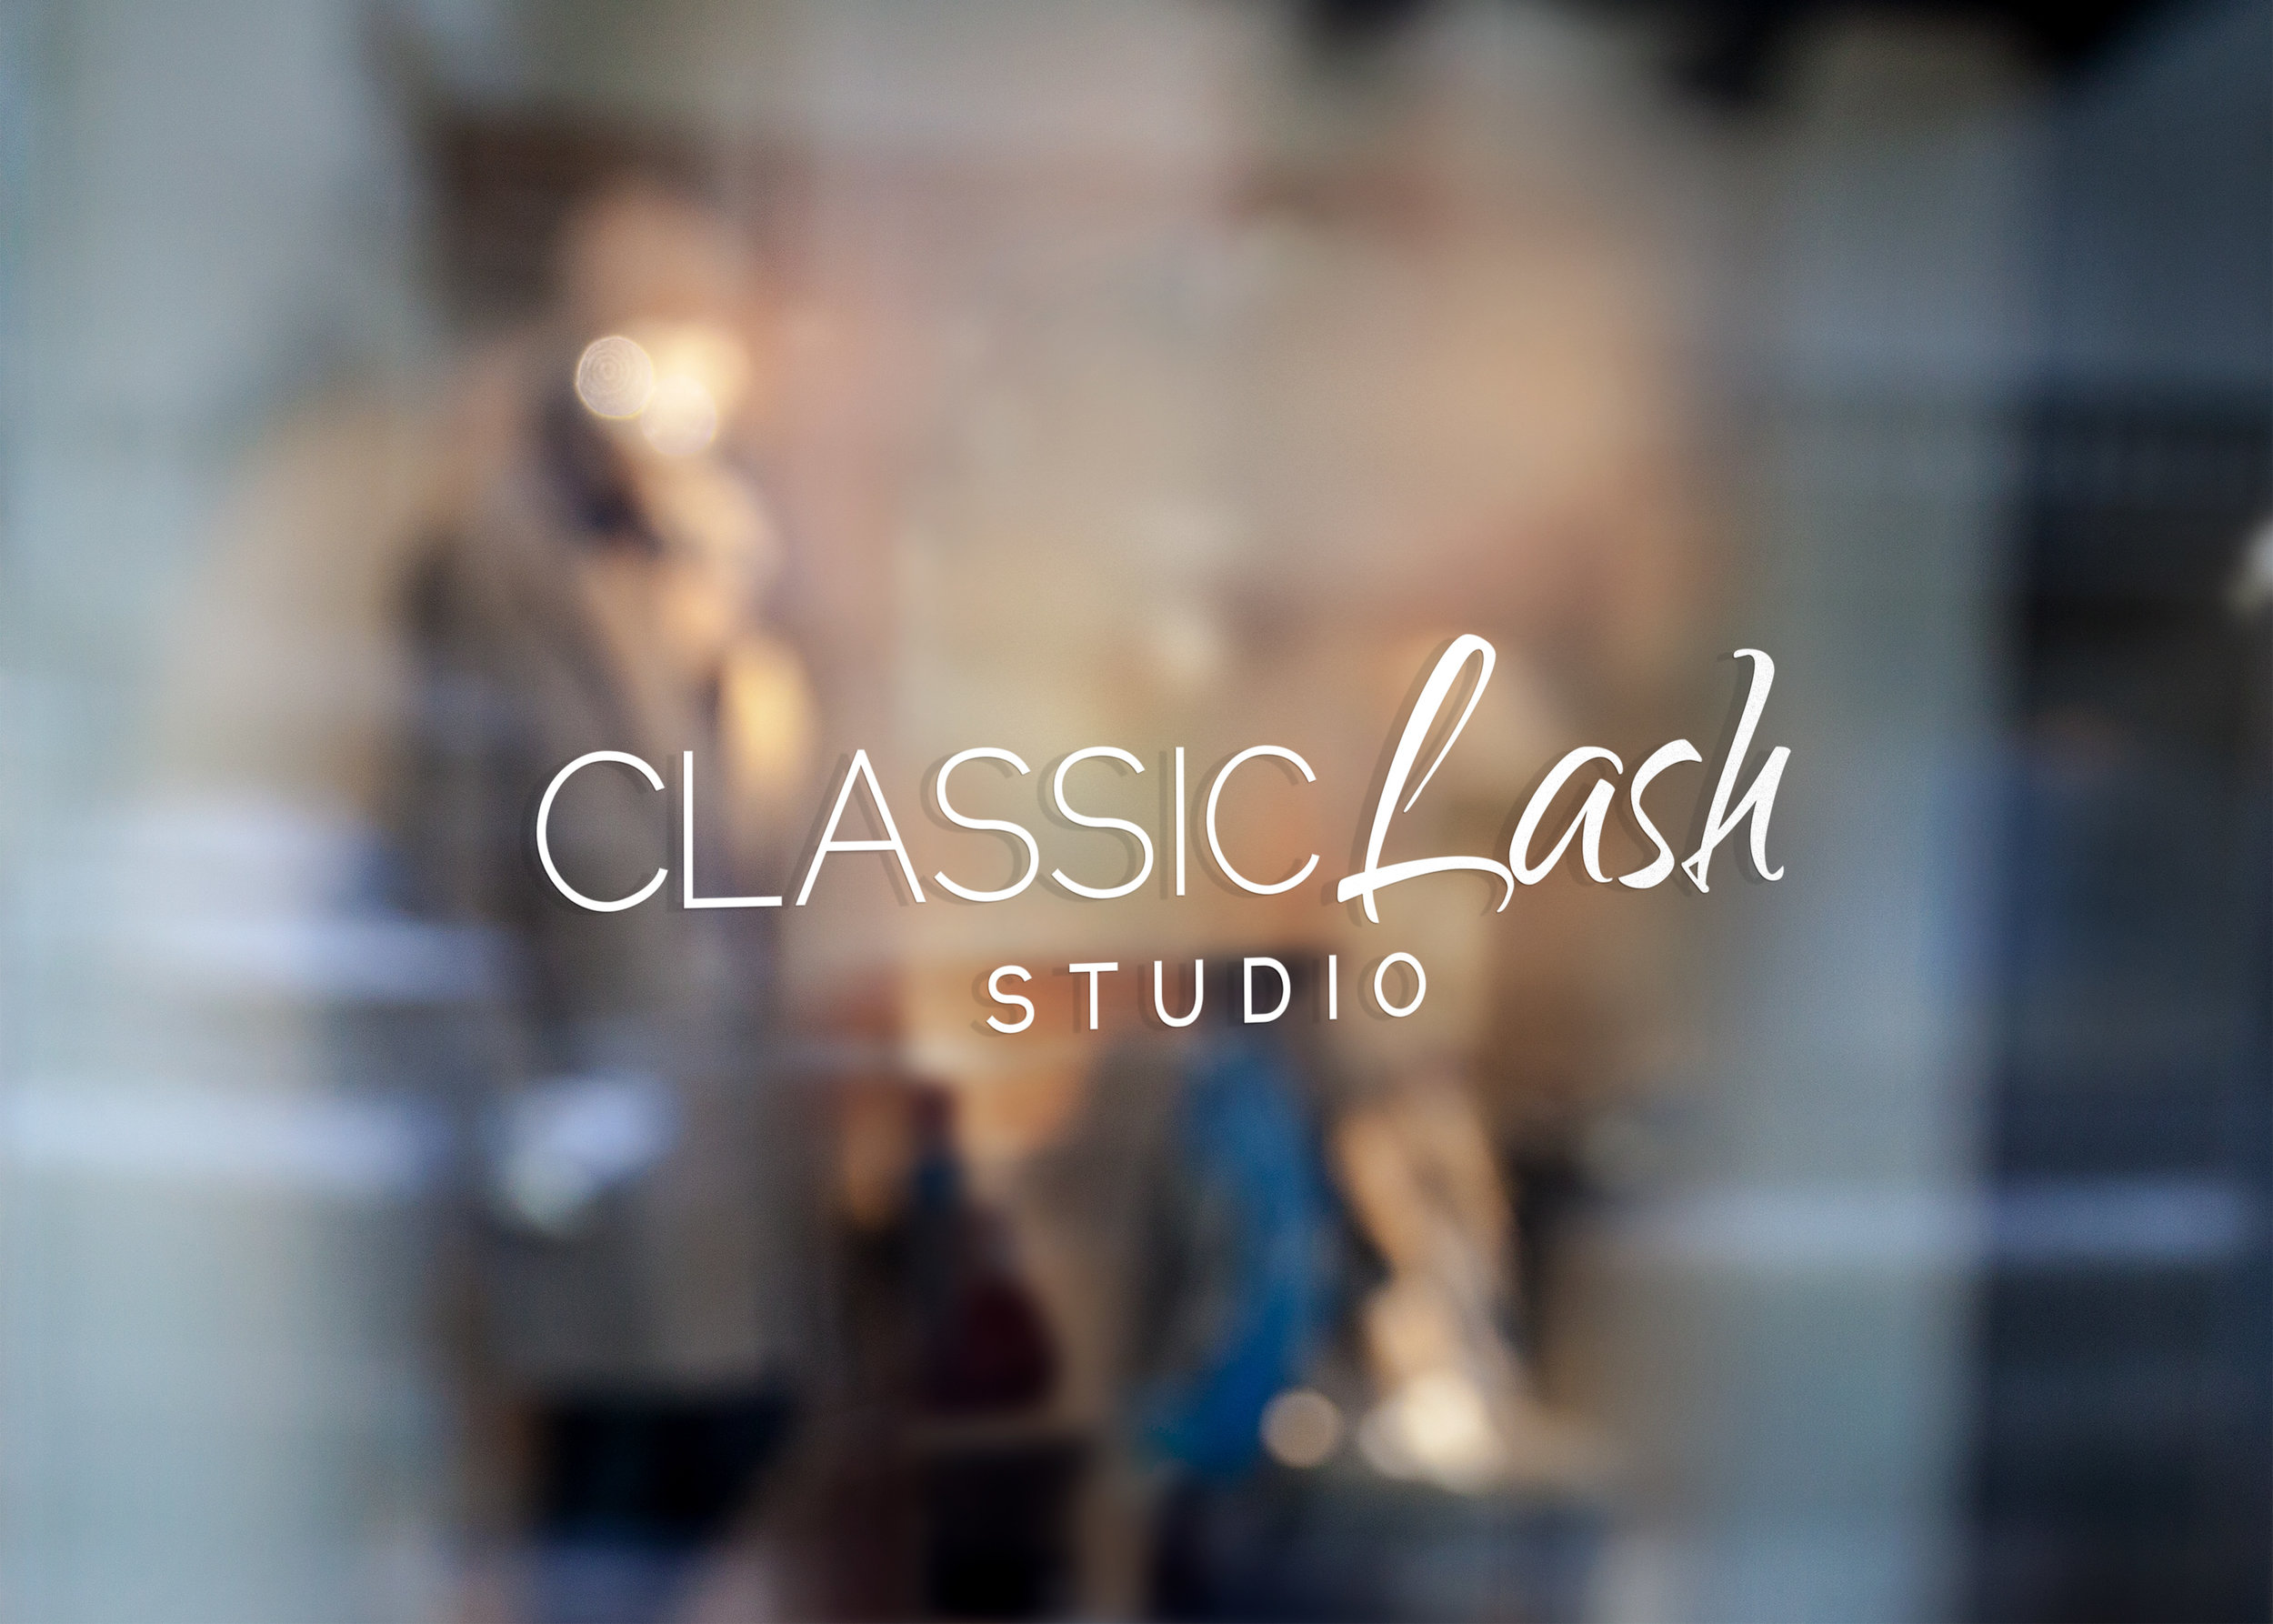 Classic-Lash-Studio-Window-Graphics-logo.jpg